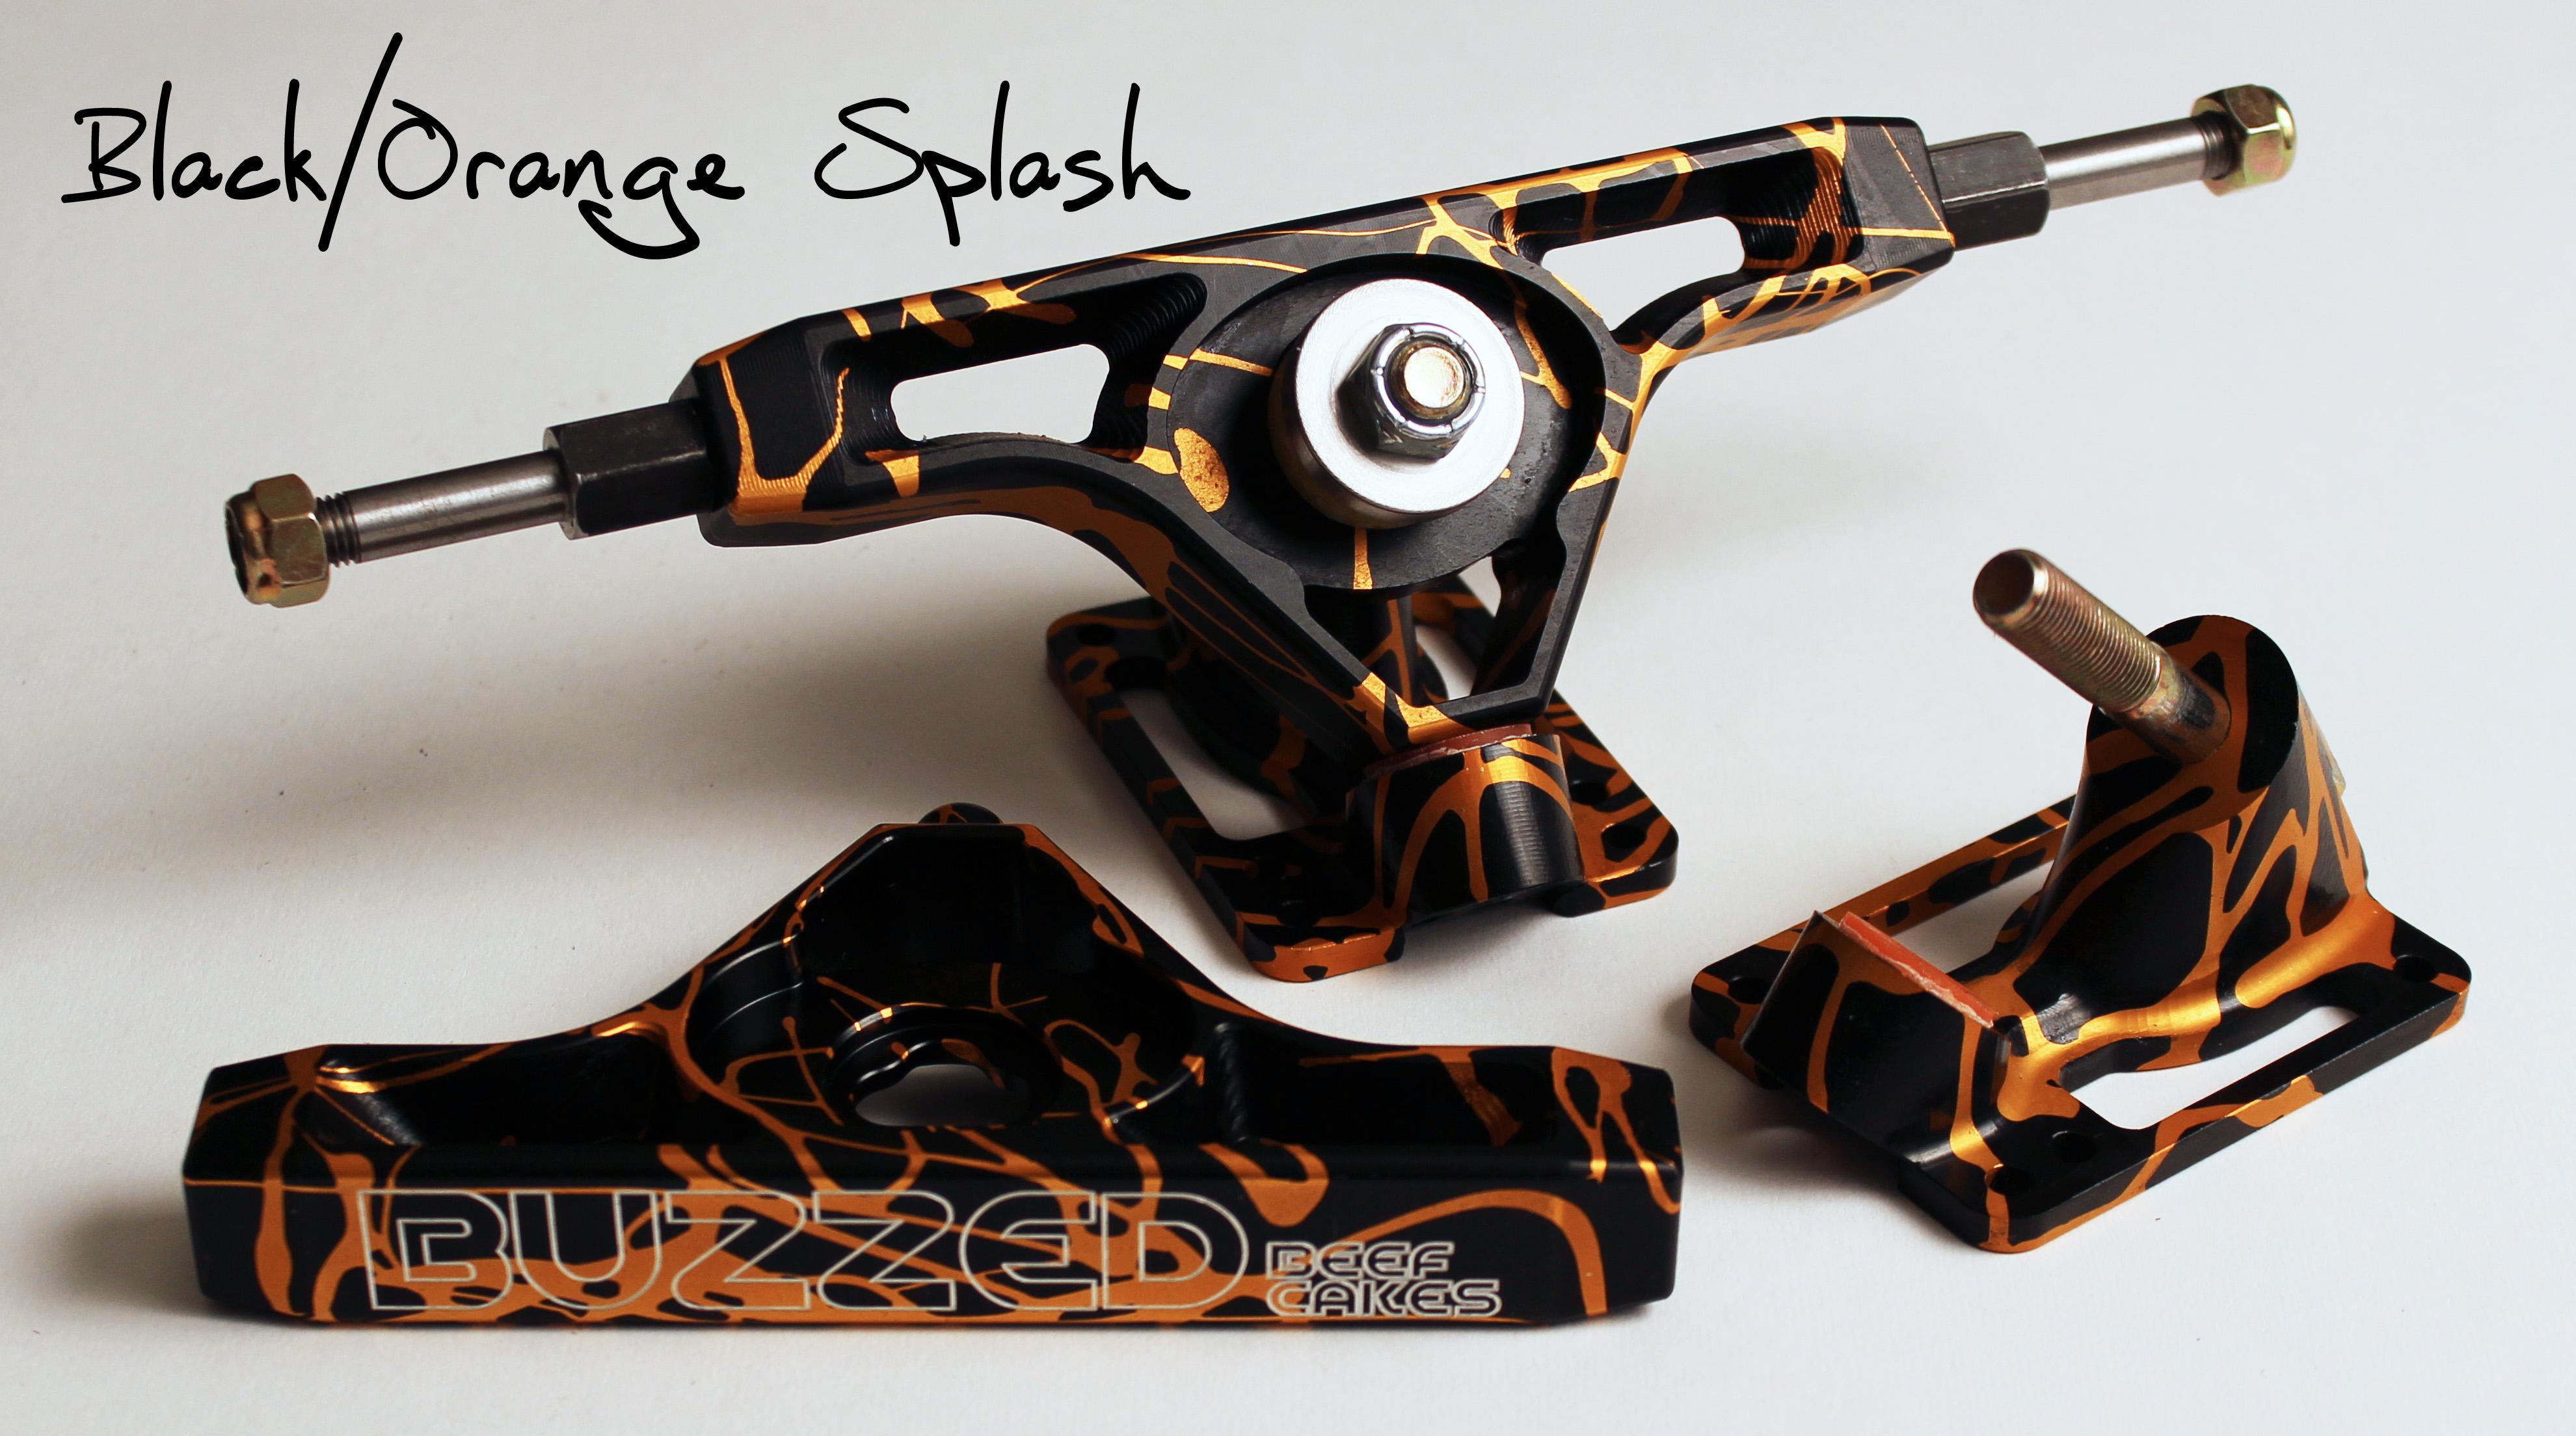 Black-Orange Splash BC